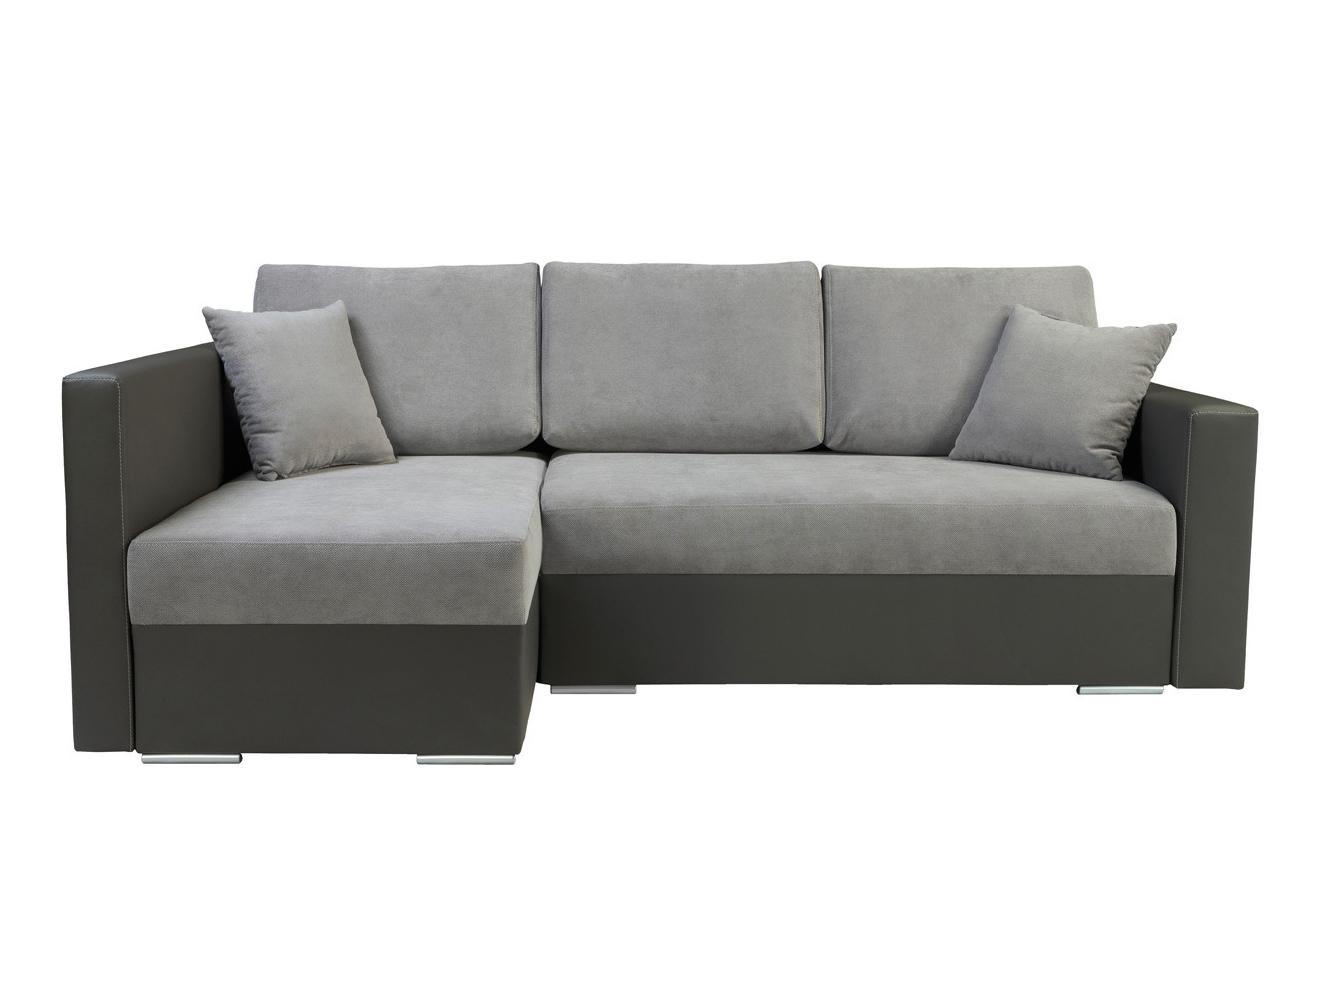 Rohová sedací souprava - BRW - Kris Lux 3DL.URC šedá (L)